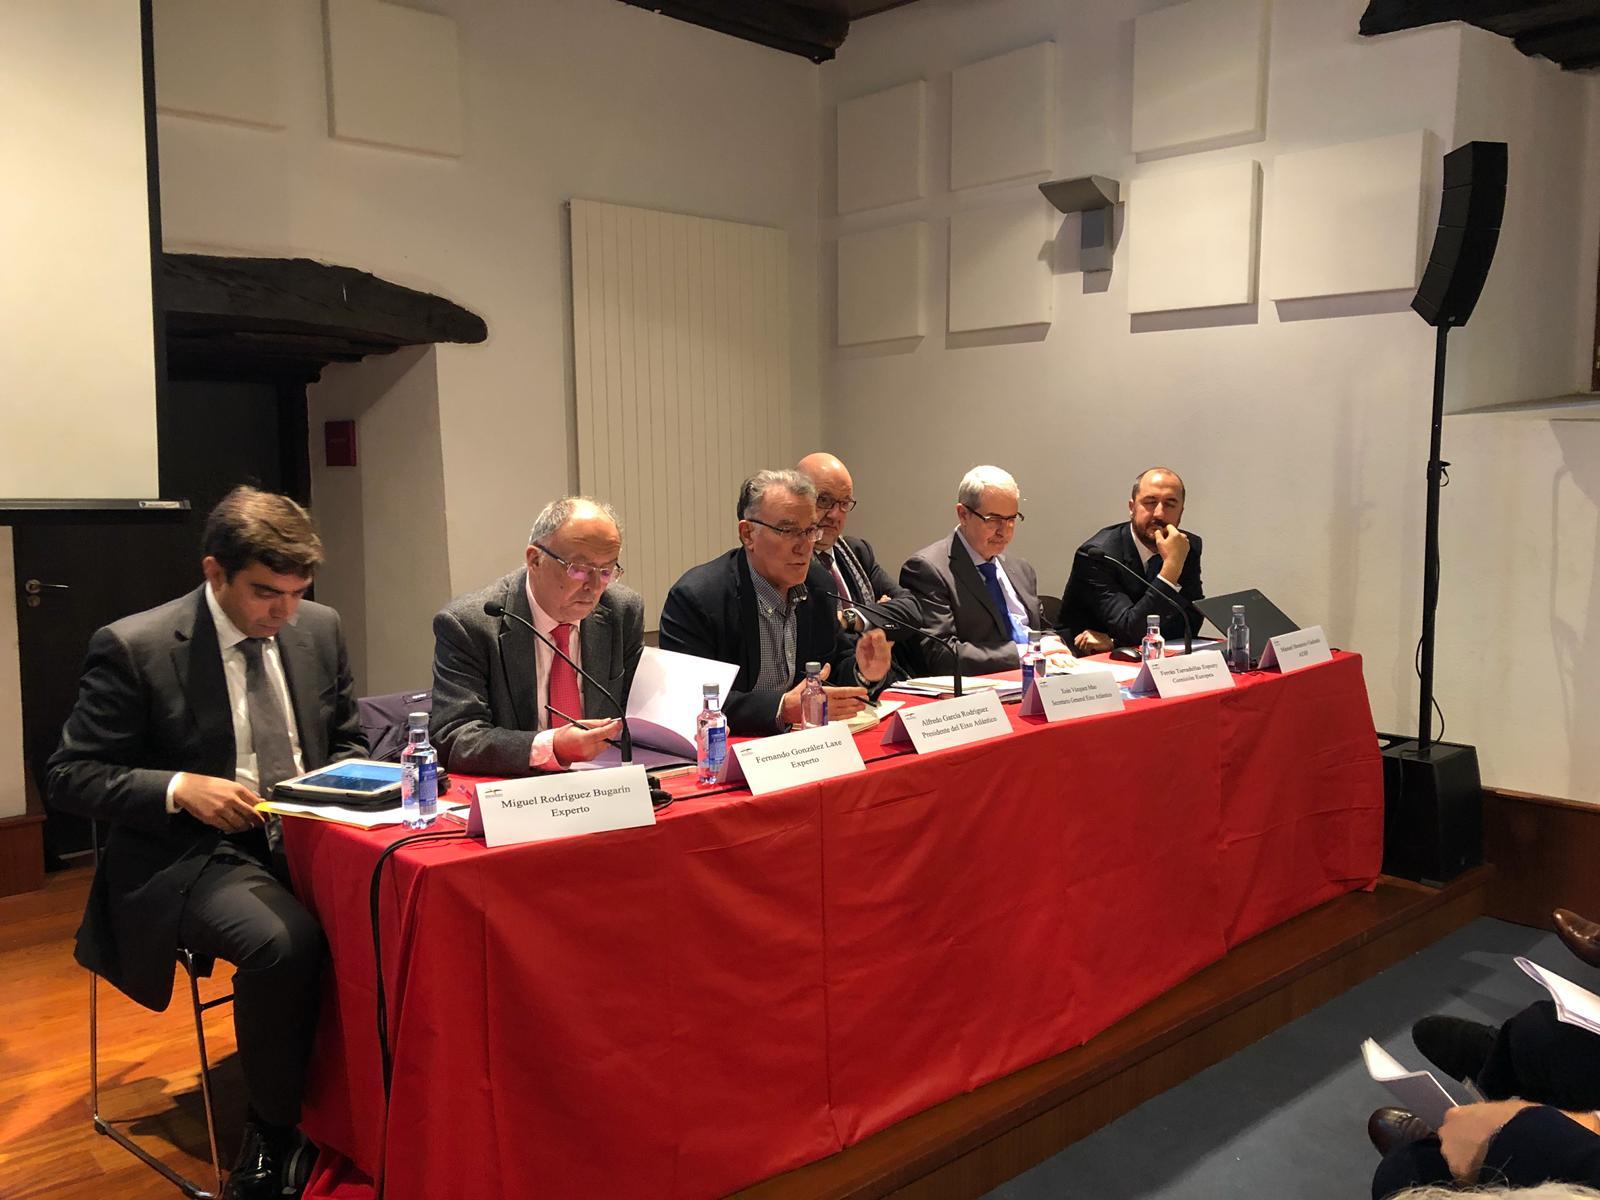 Reunión en O Barco sobre la línea ferroviaria Monforte-Palencia